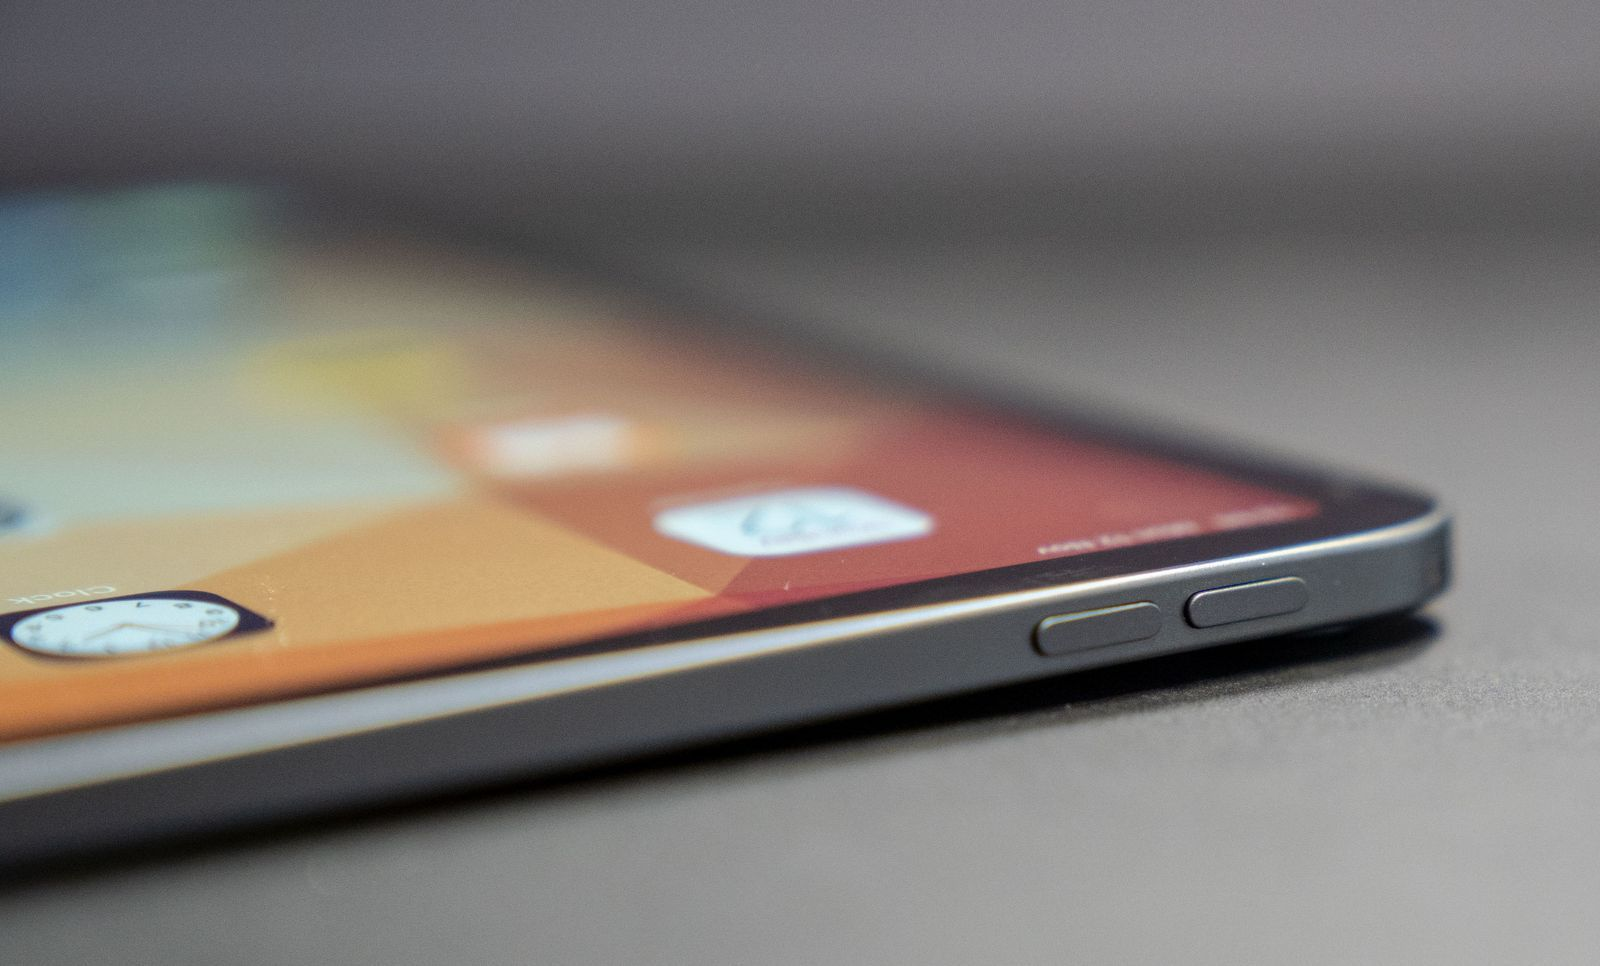 Enkelte tror at de samme skarpe kantene fra iPad Pro-designet kommer tilbake på årets iPhone. Sist vi så flate og skarpe kanter på en iPhone var iPhone 5S og iPhone SE.